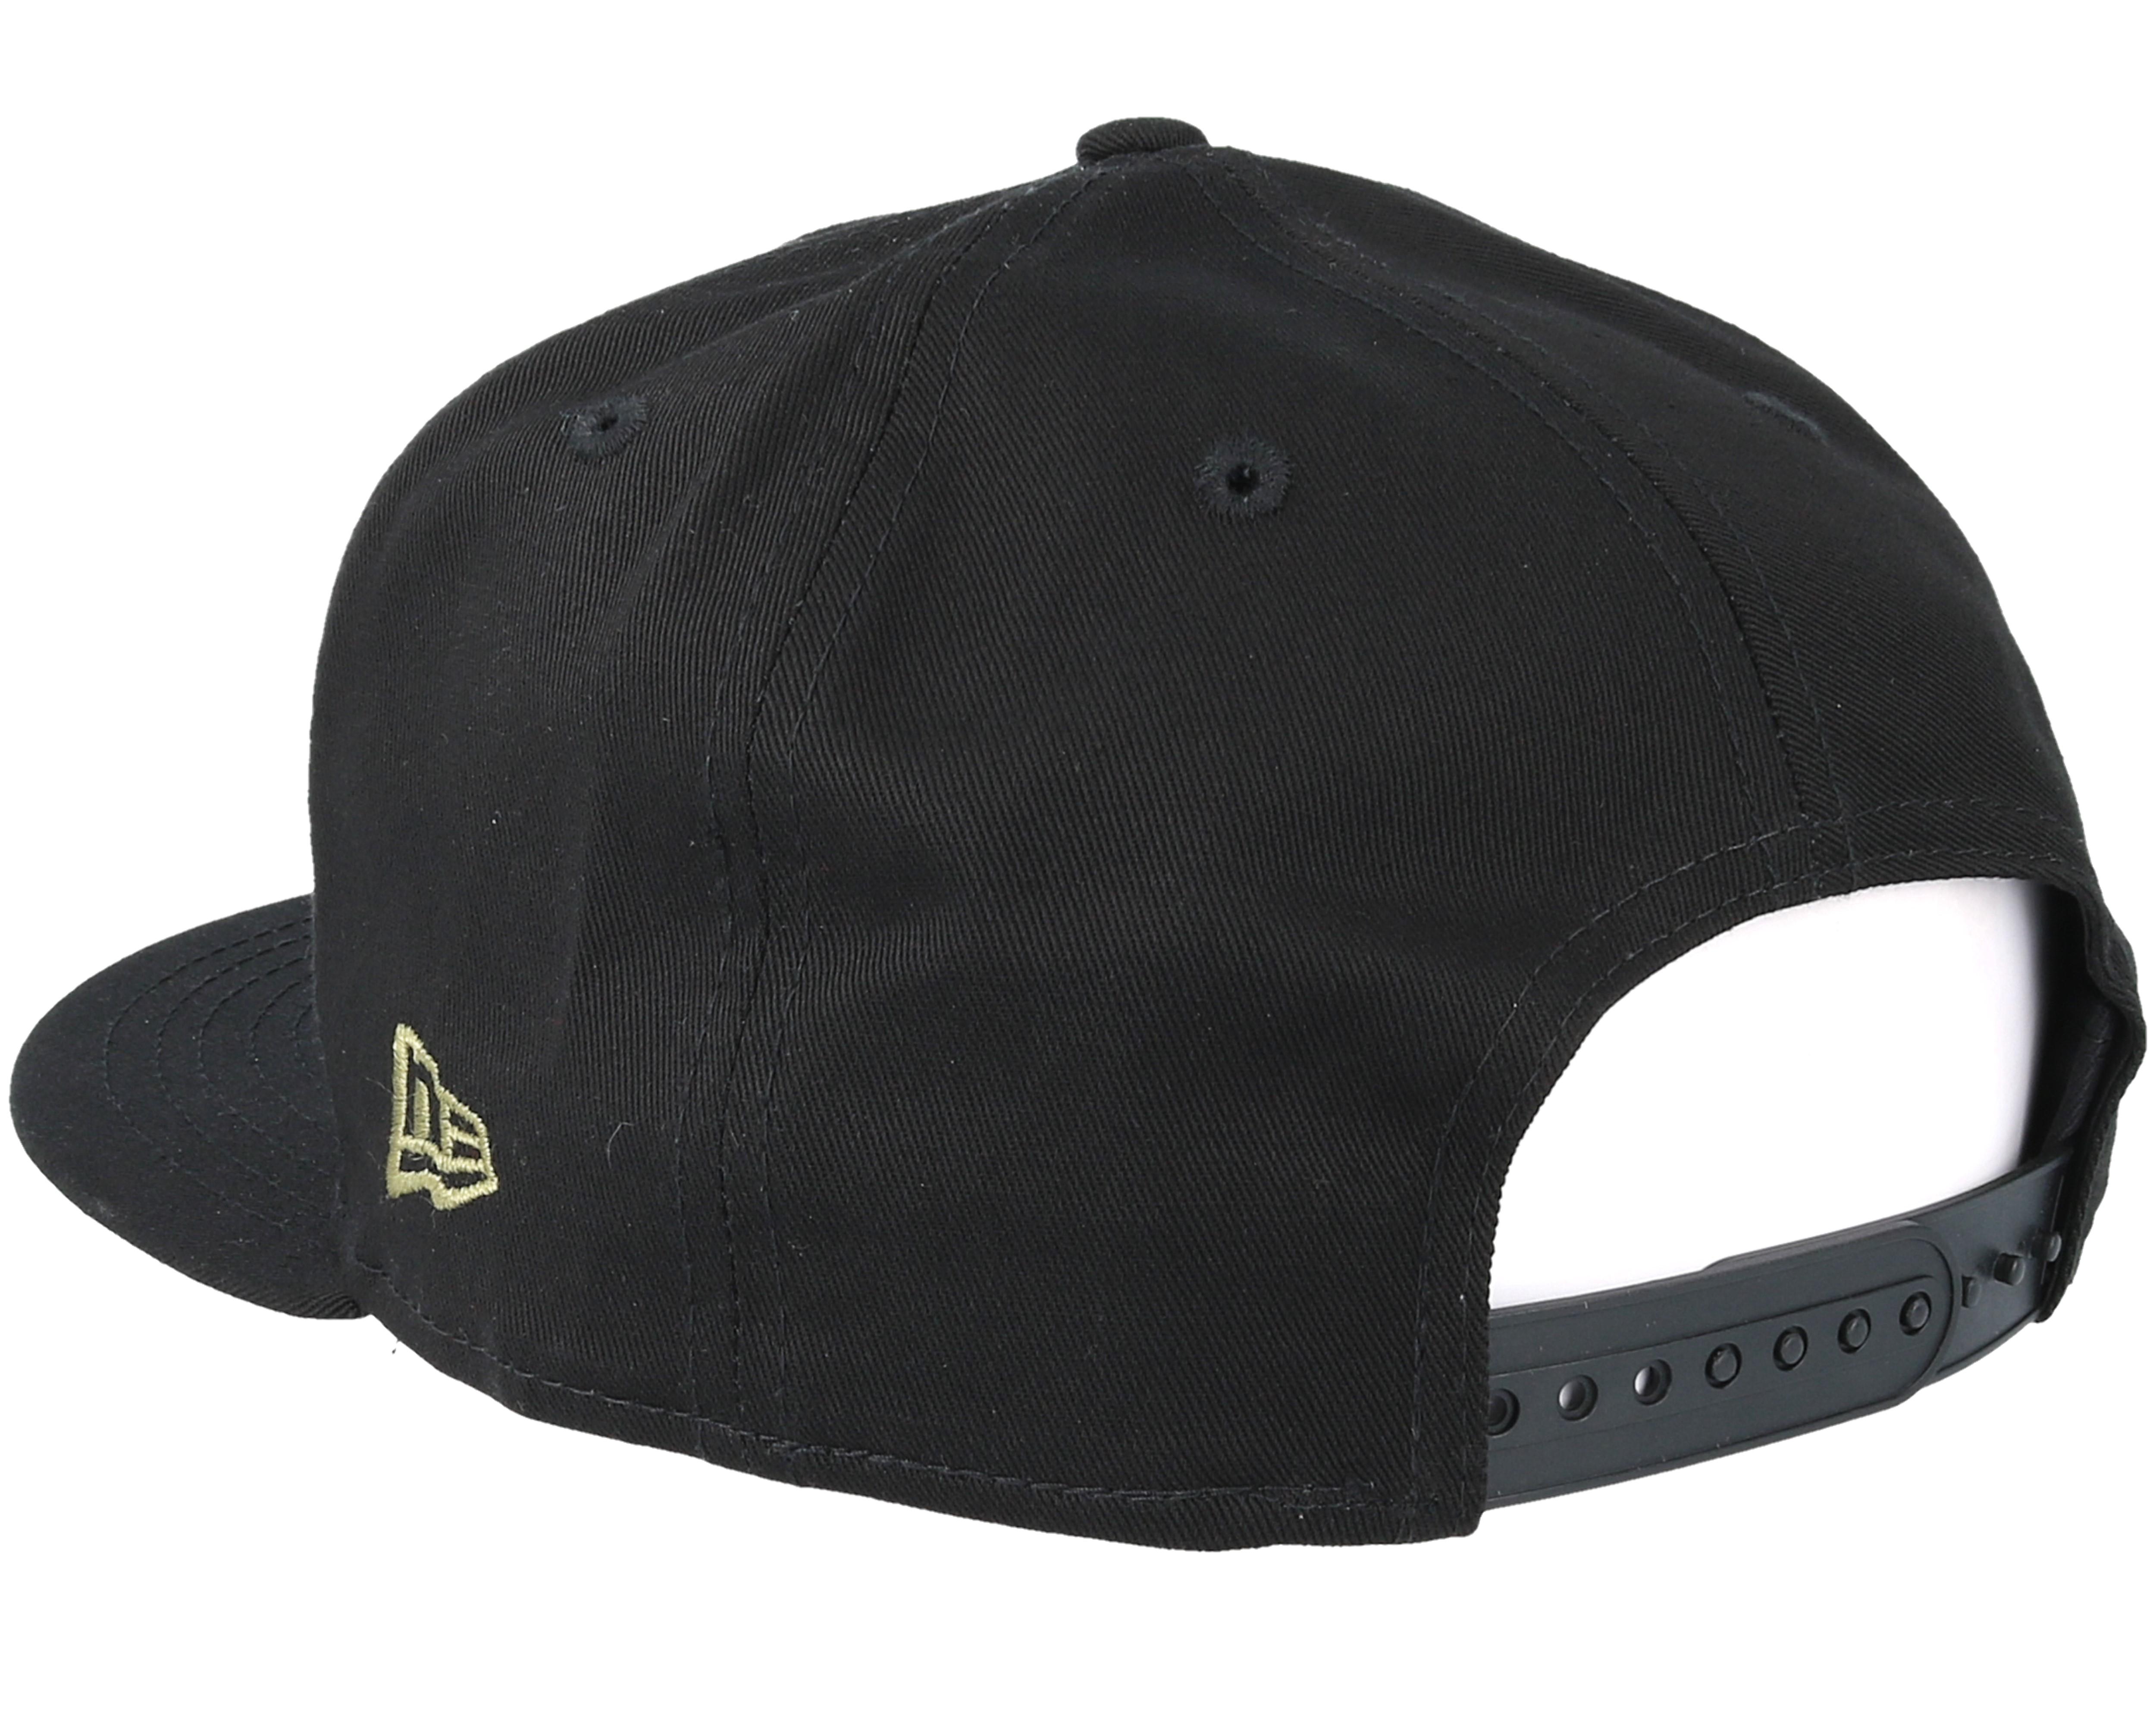 new york yankees league essential 9fifty black olive snapback new era cap. Black Bedroom Furniture Sets. Home Design Ideas